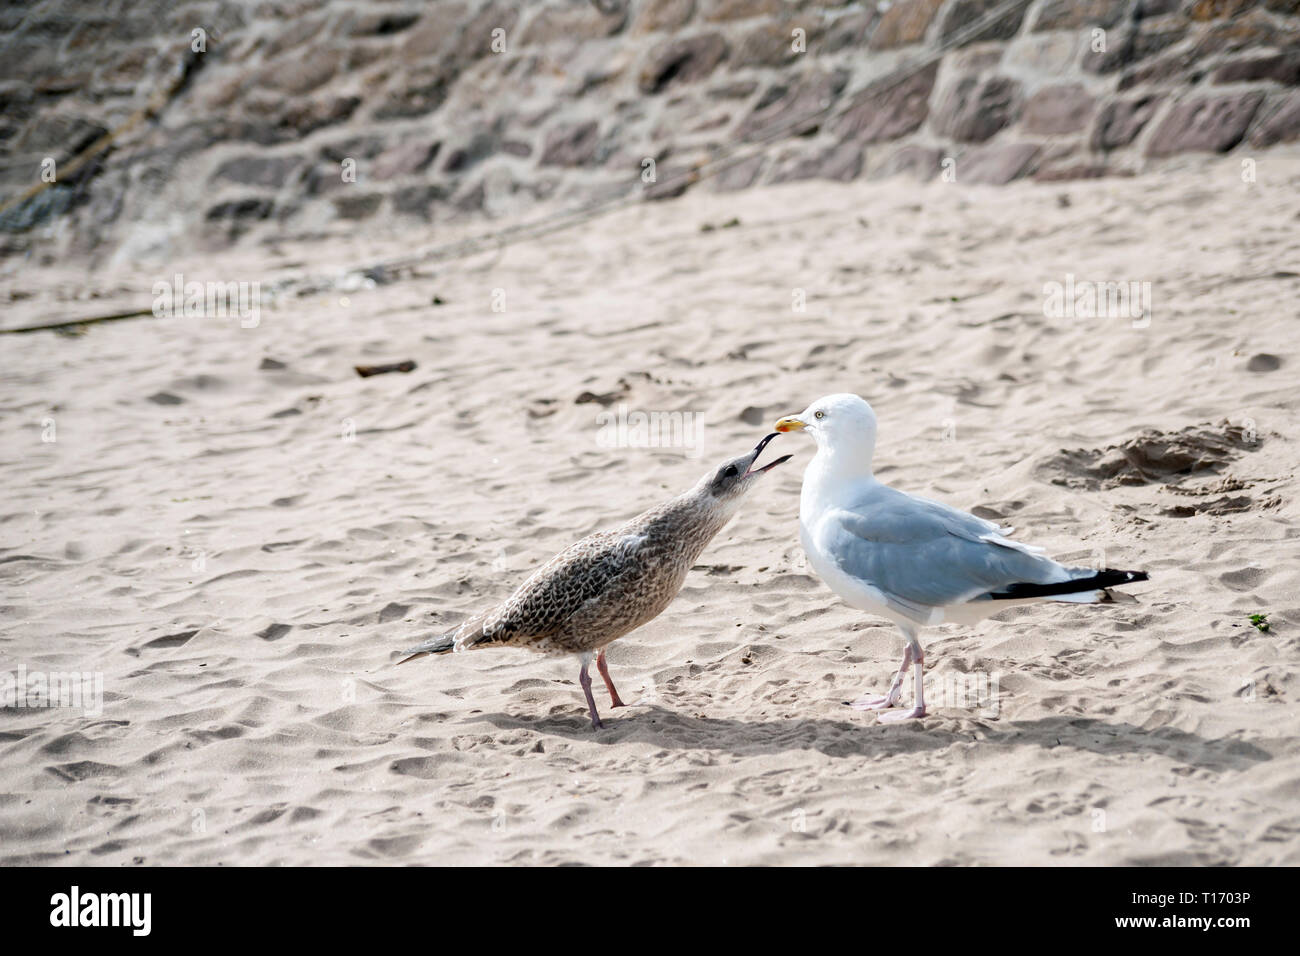 Juvenile herring gull, Laras argentatus demanding food on sandy beach, from it's mother - Stock Image